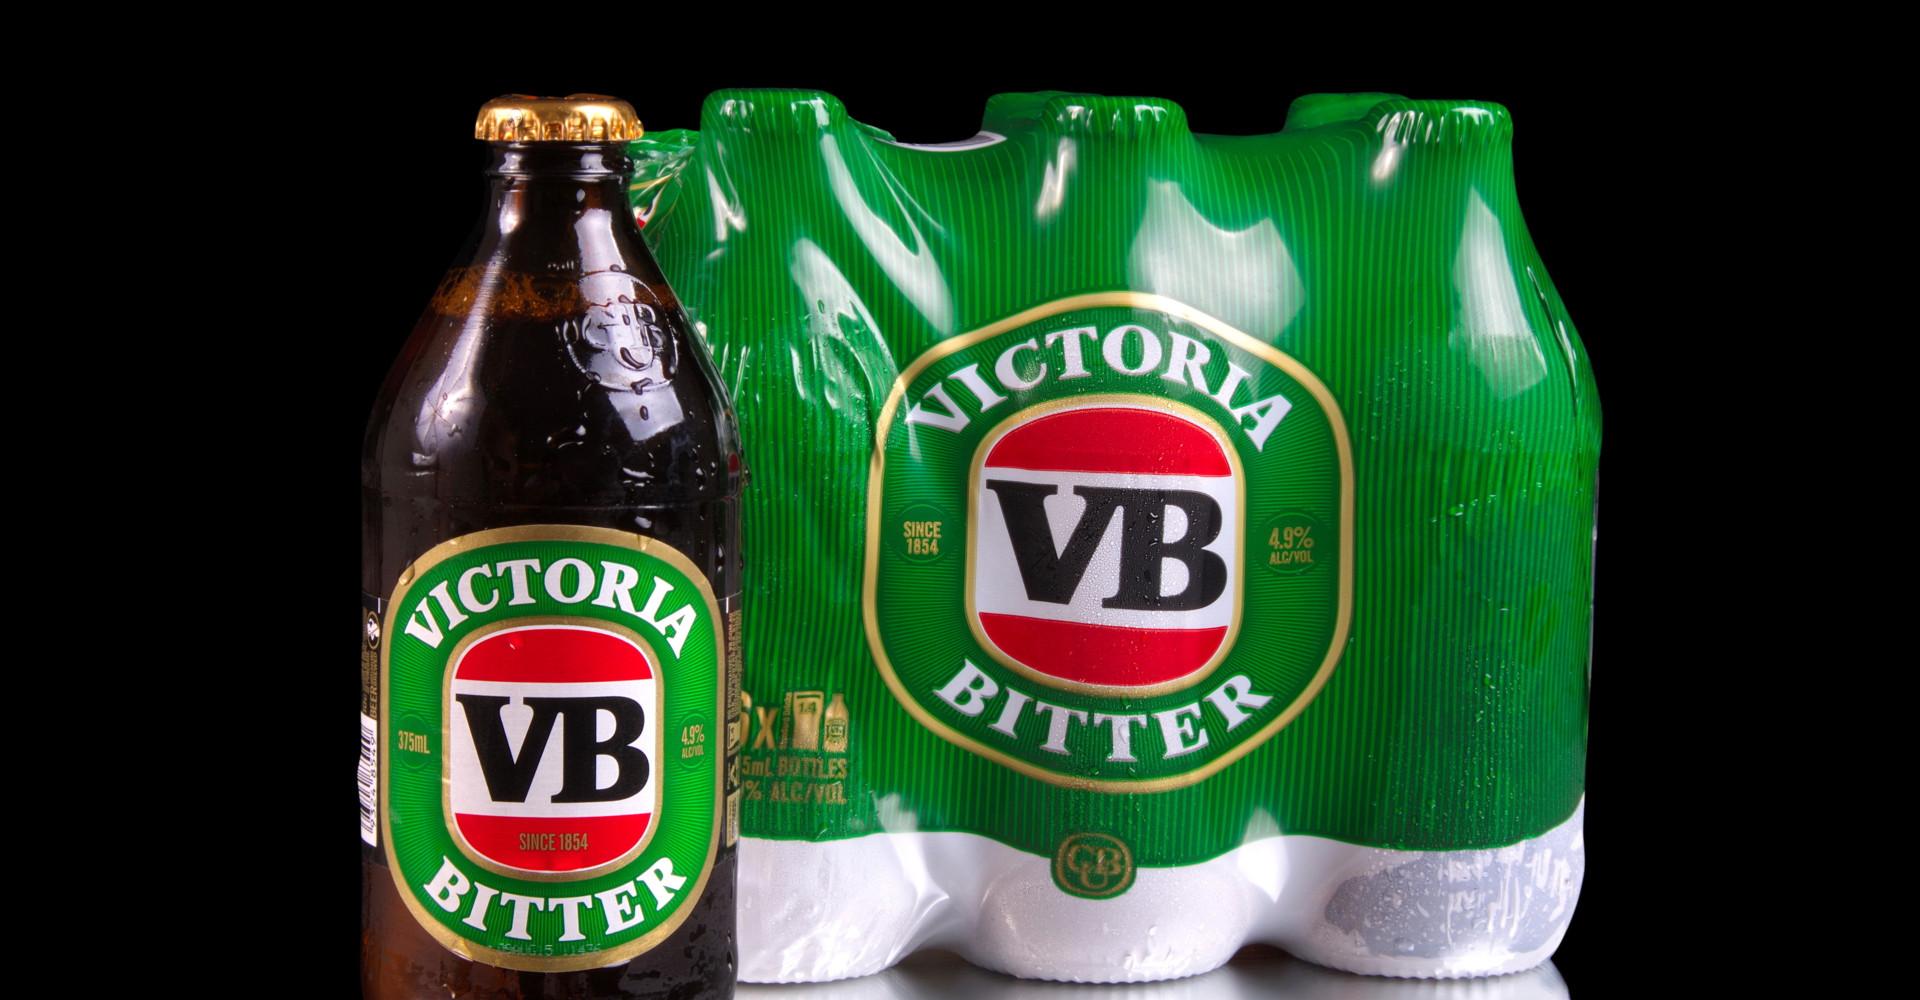 Worst 30 Aussie beers according to the internet